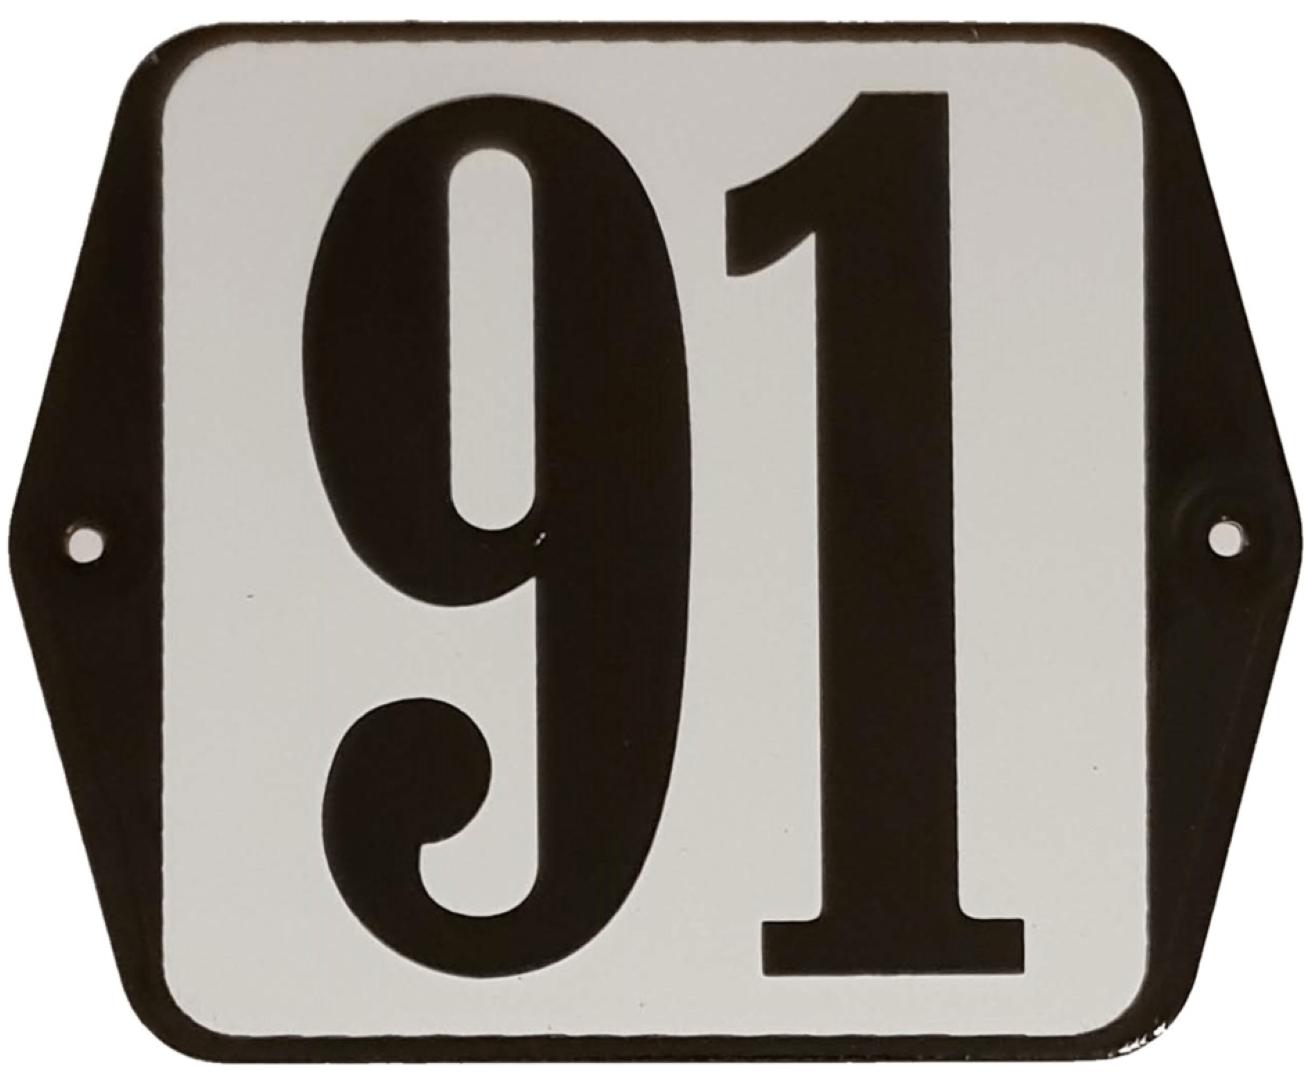 Huisnummer standaard nummer 91